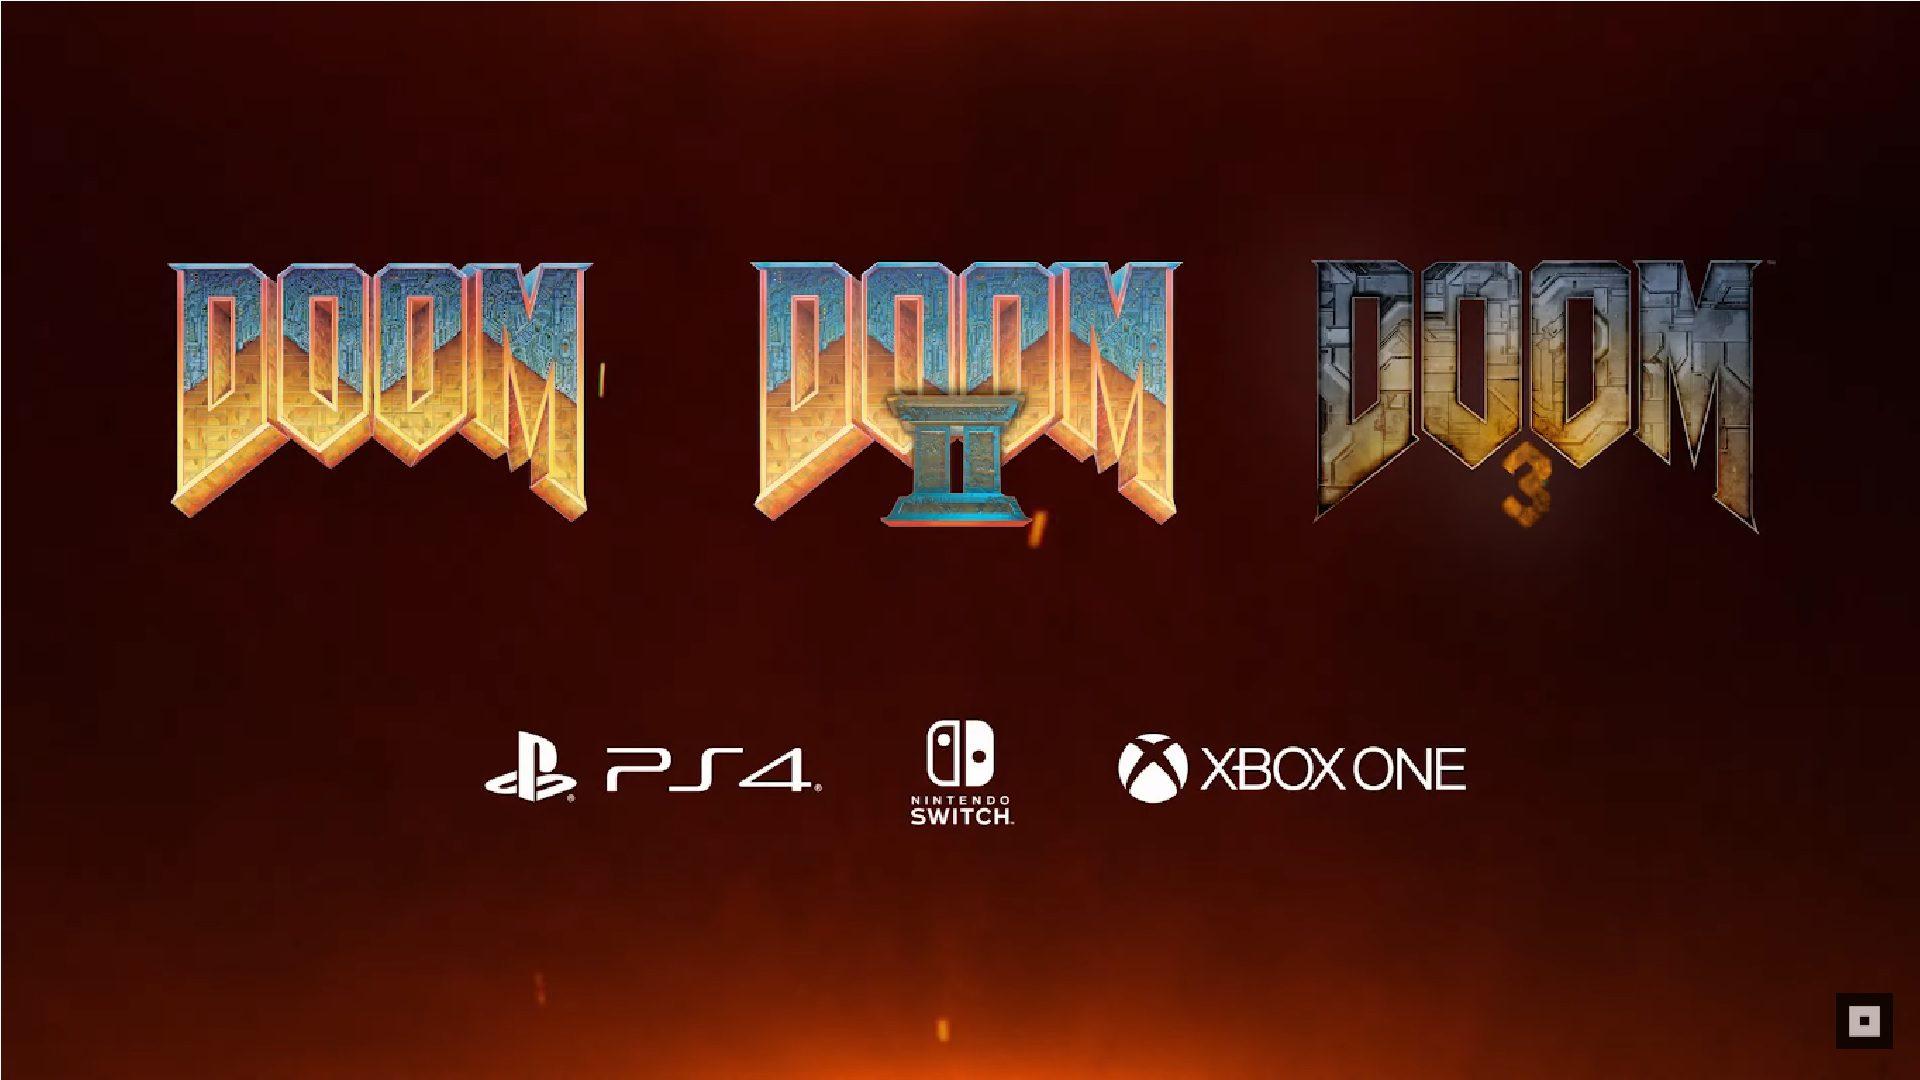 Bombshell! Doom, Doom II and Doom 3 have been re-launched for Xbox